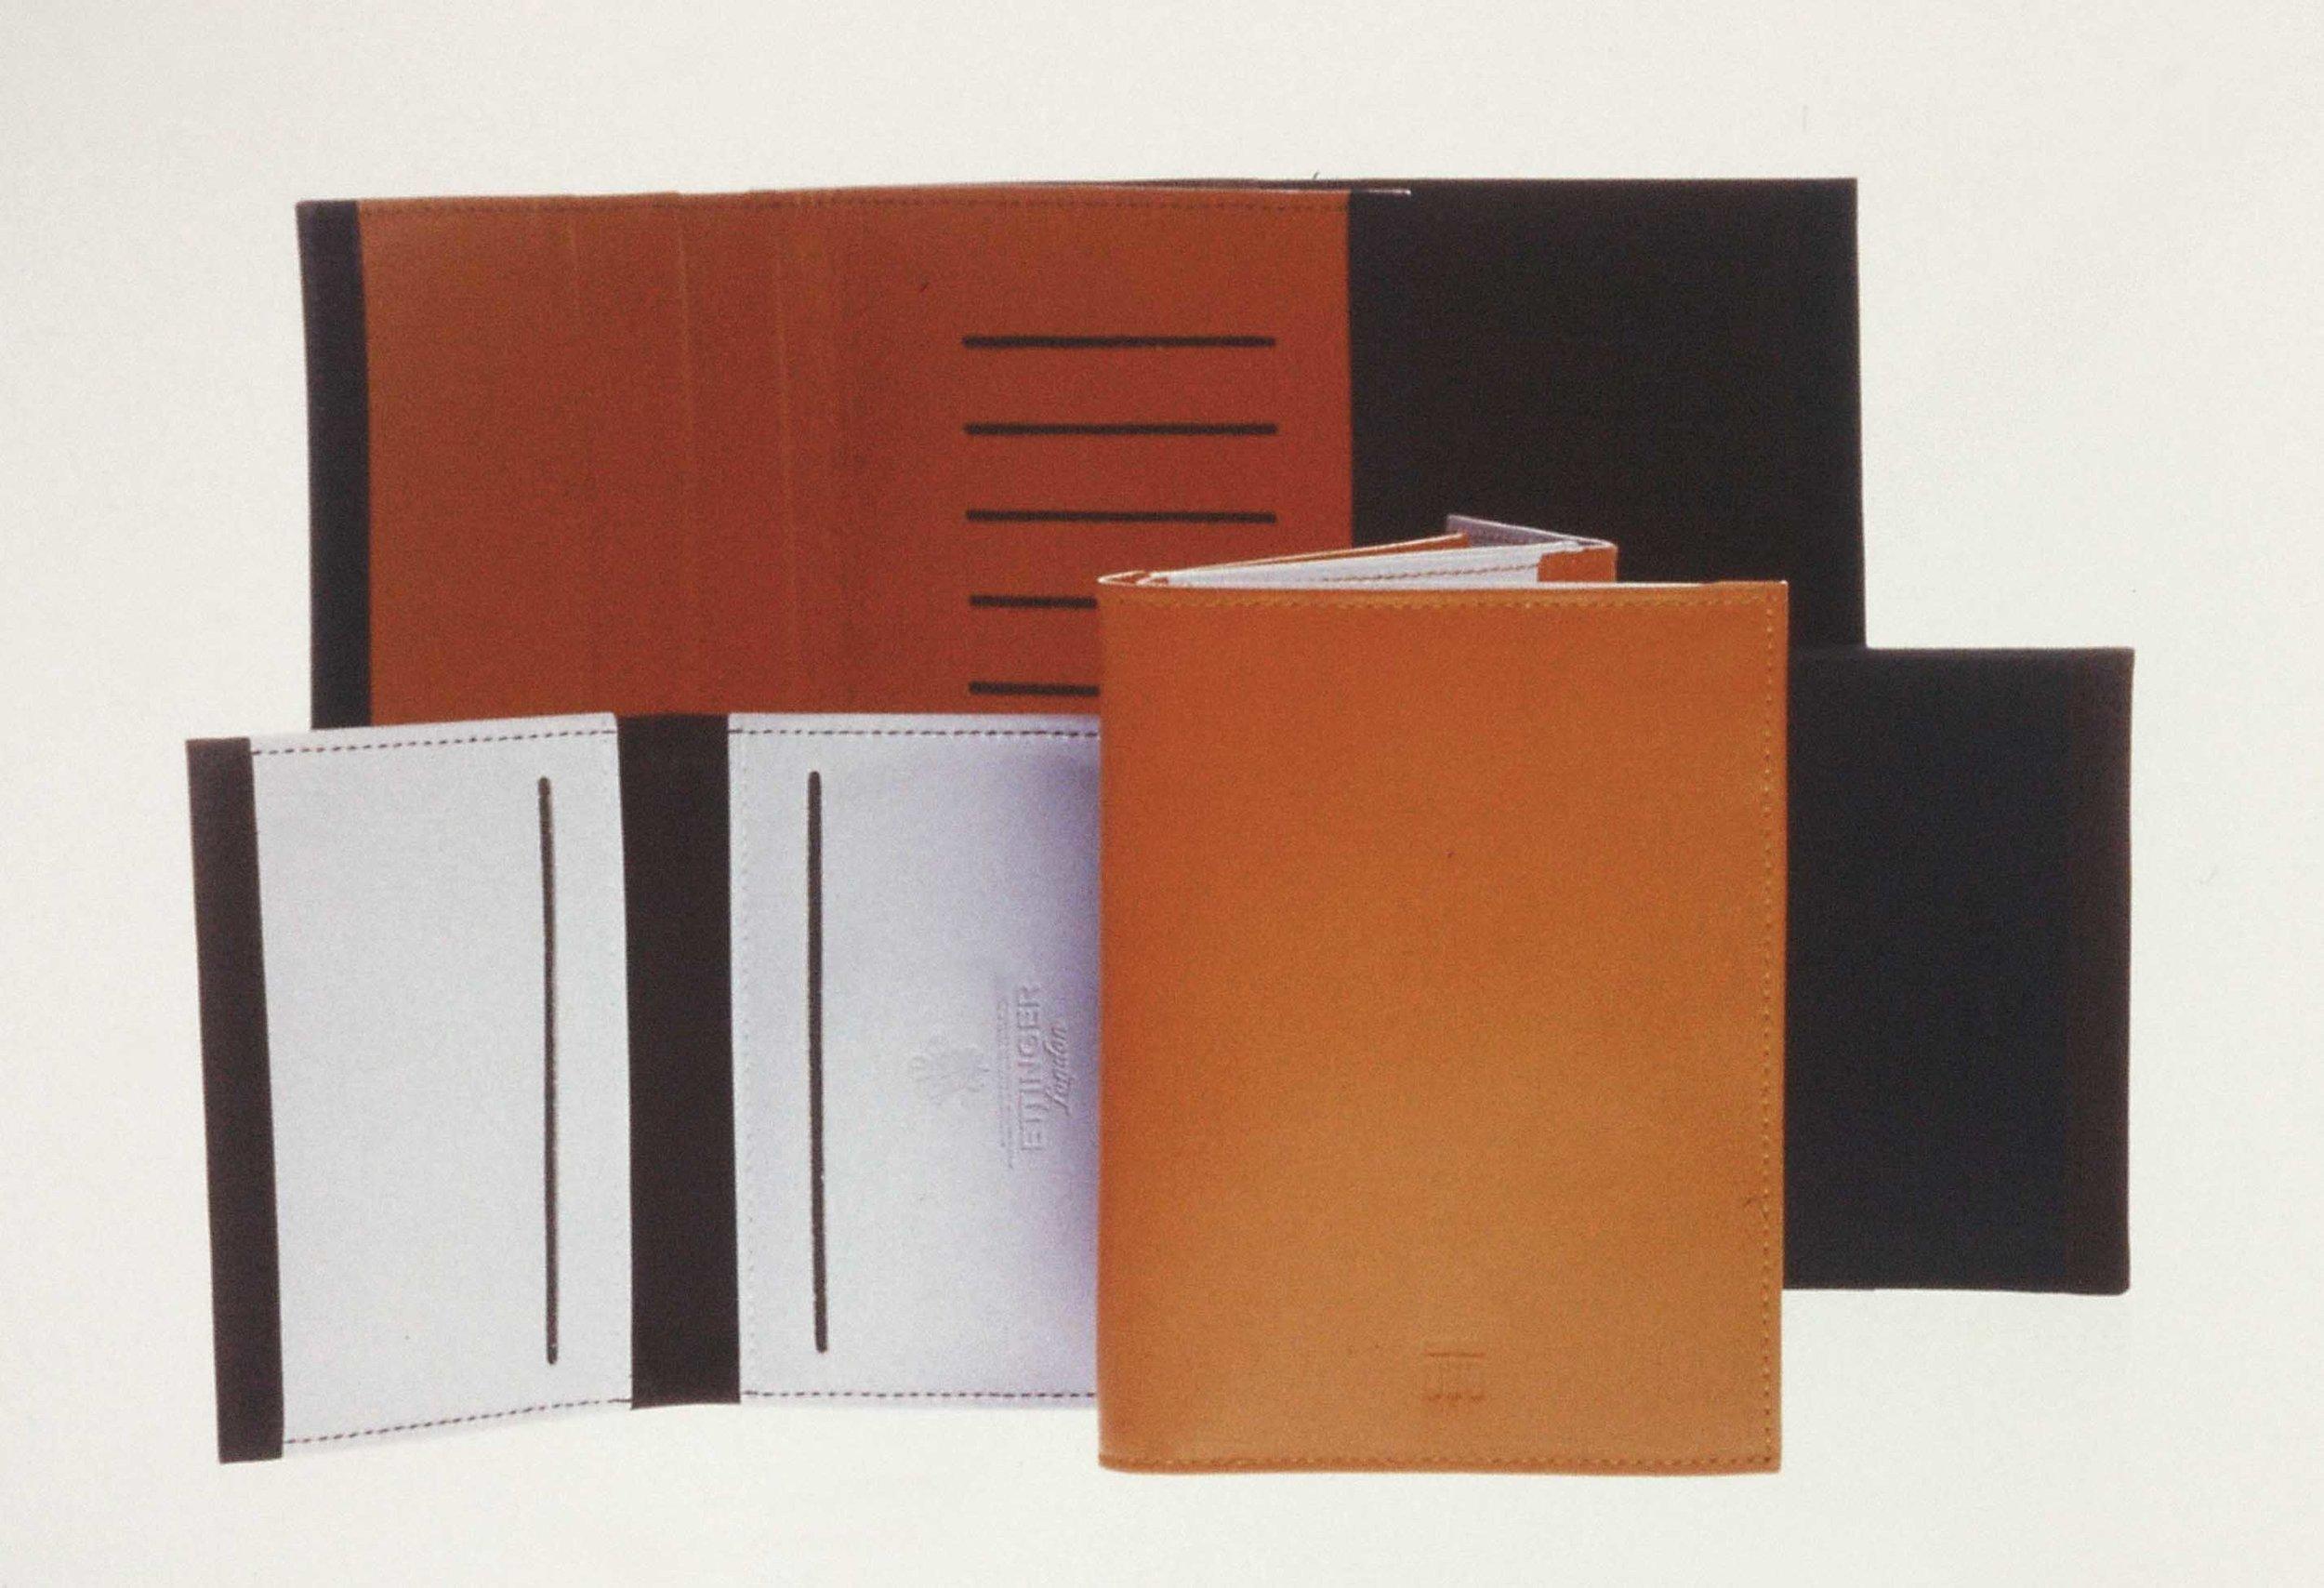 Ettinger x Pearson Lloyd wallets range